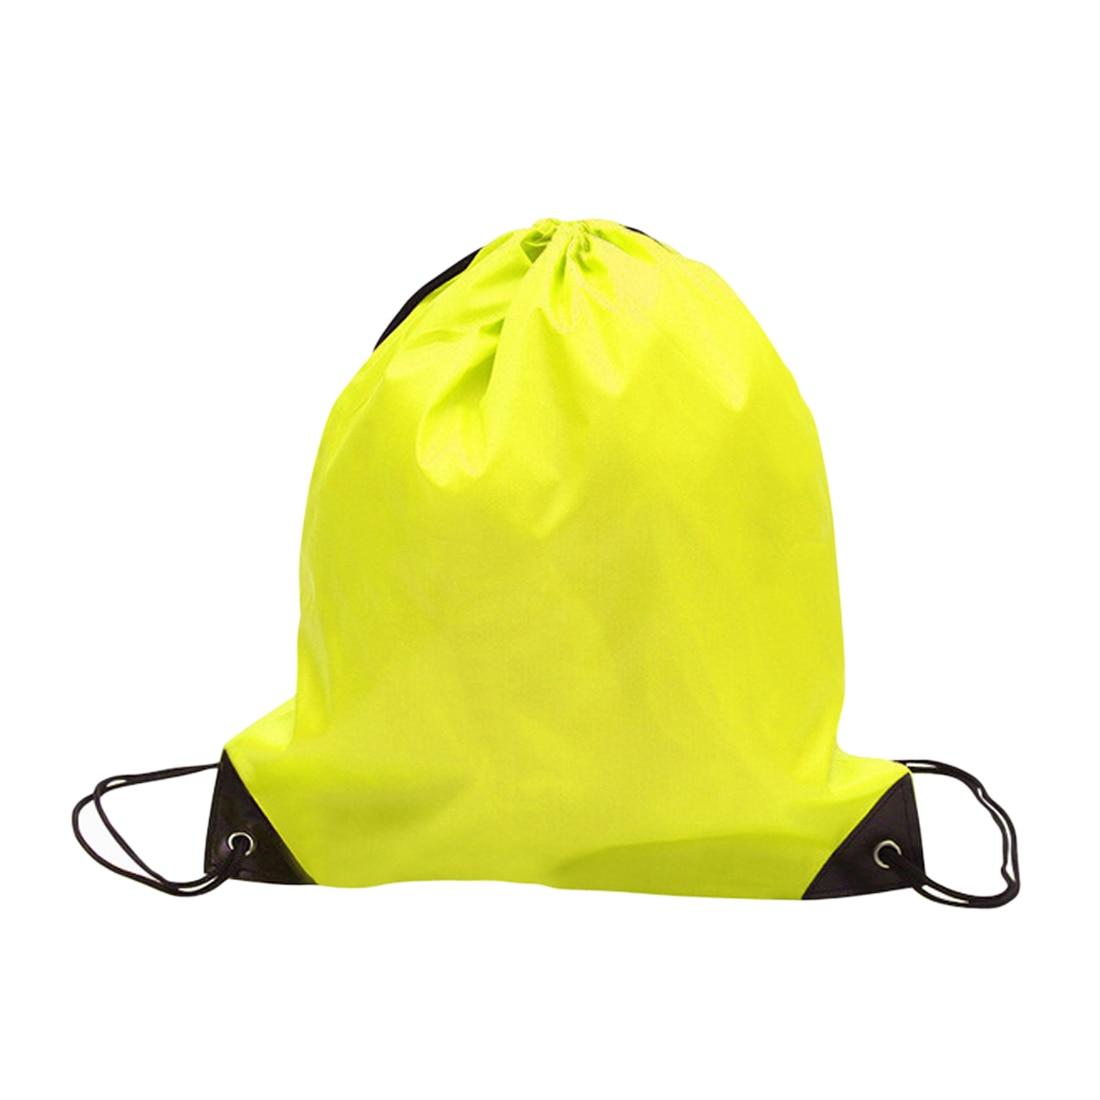 Unisex Drawstring Bag Backpack Waterproof Gym PE Bag Swim School Sports Dance